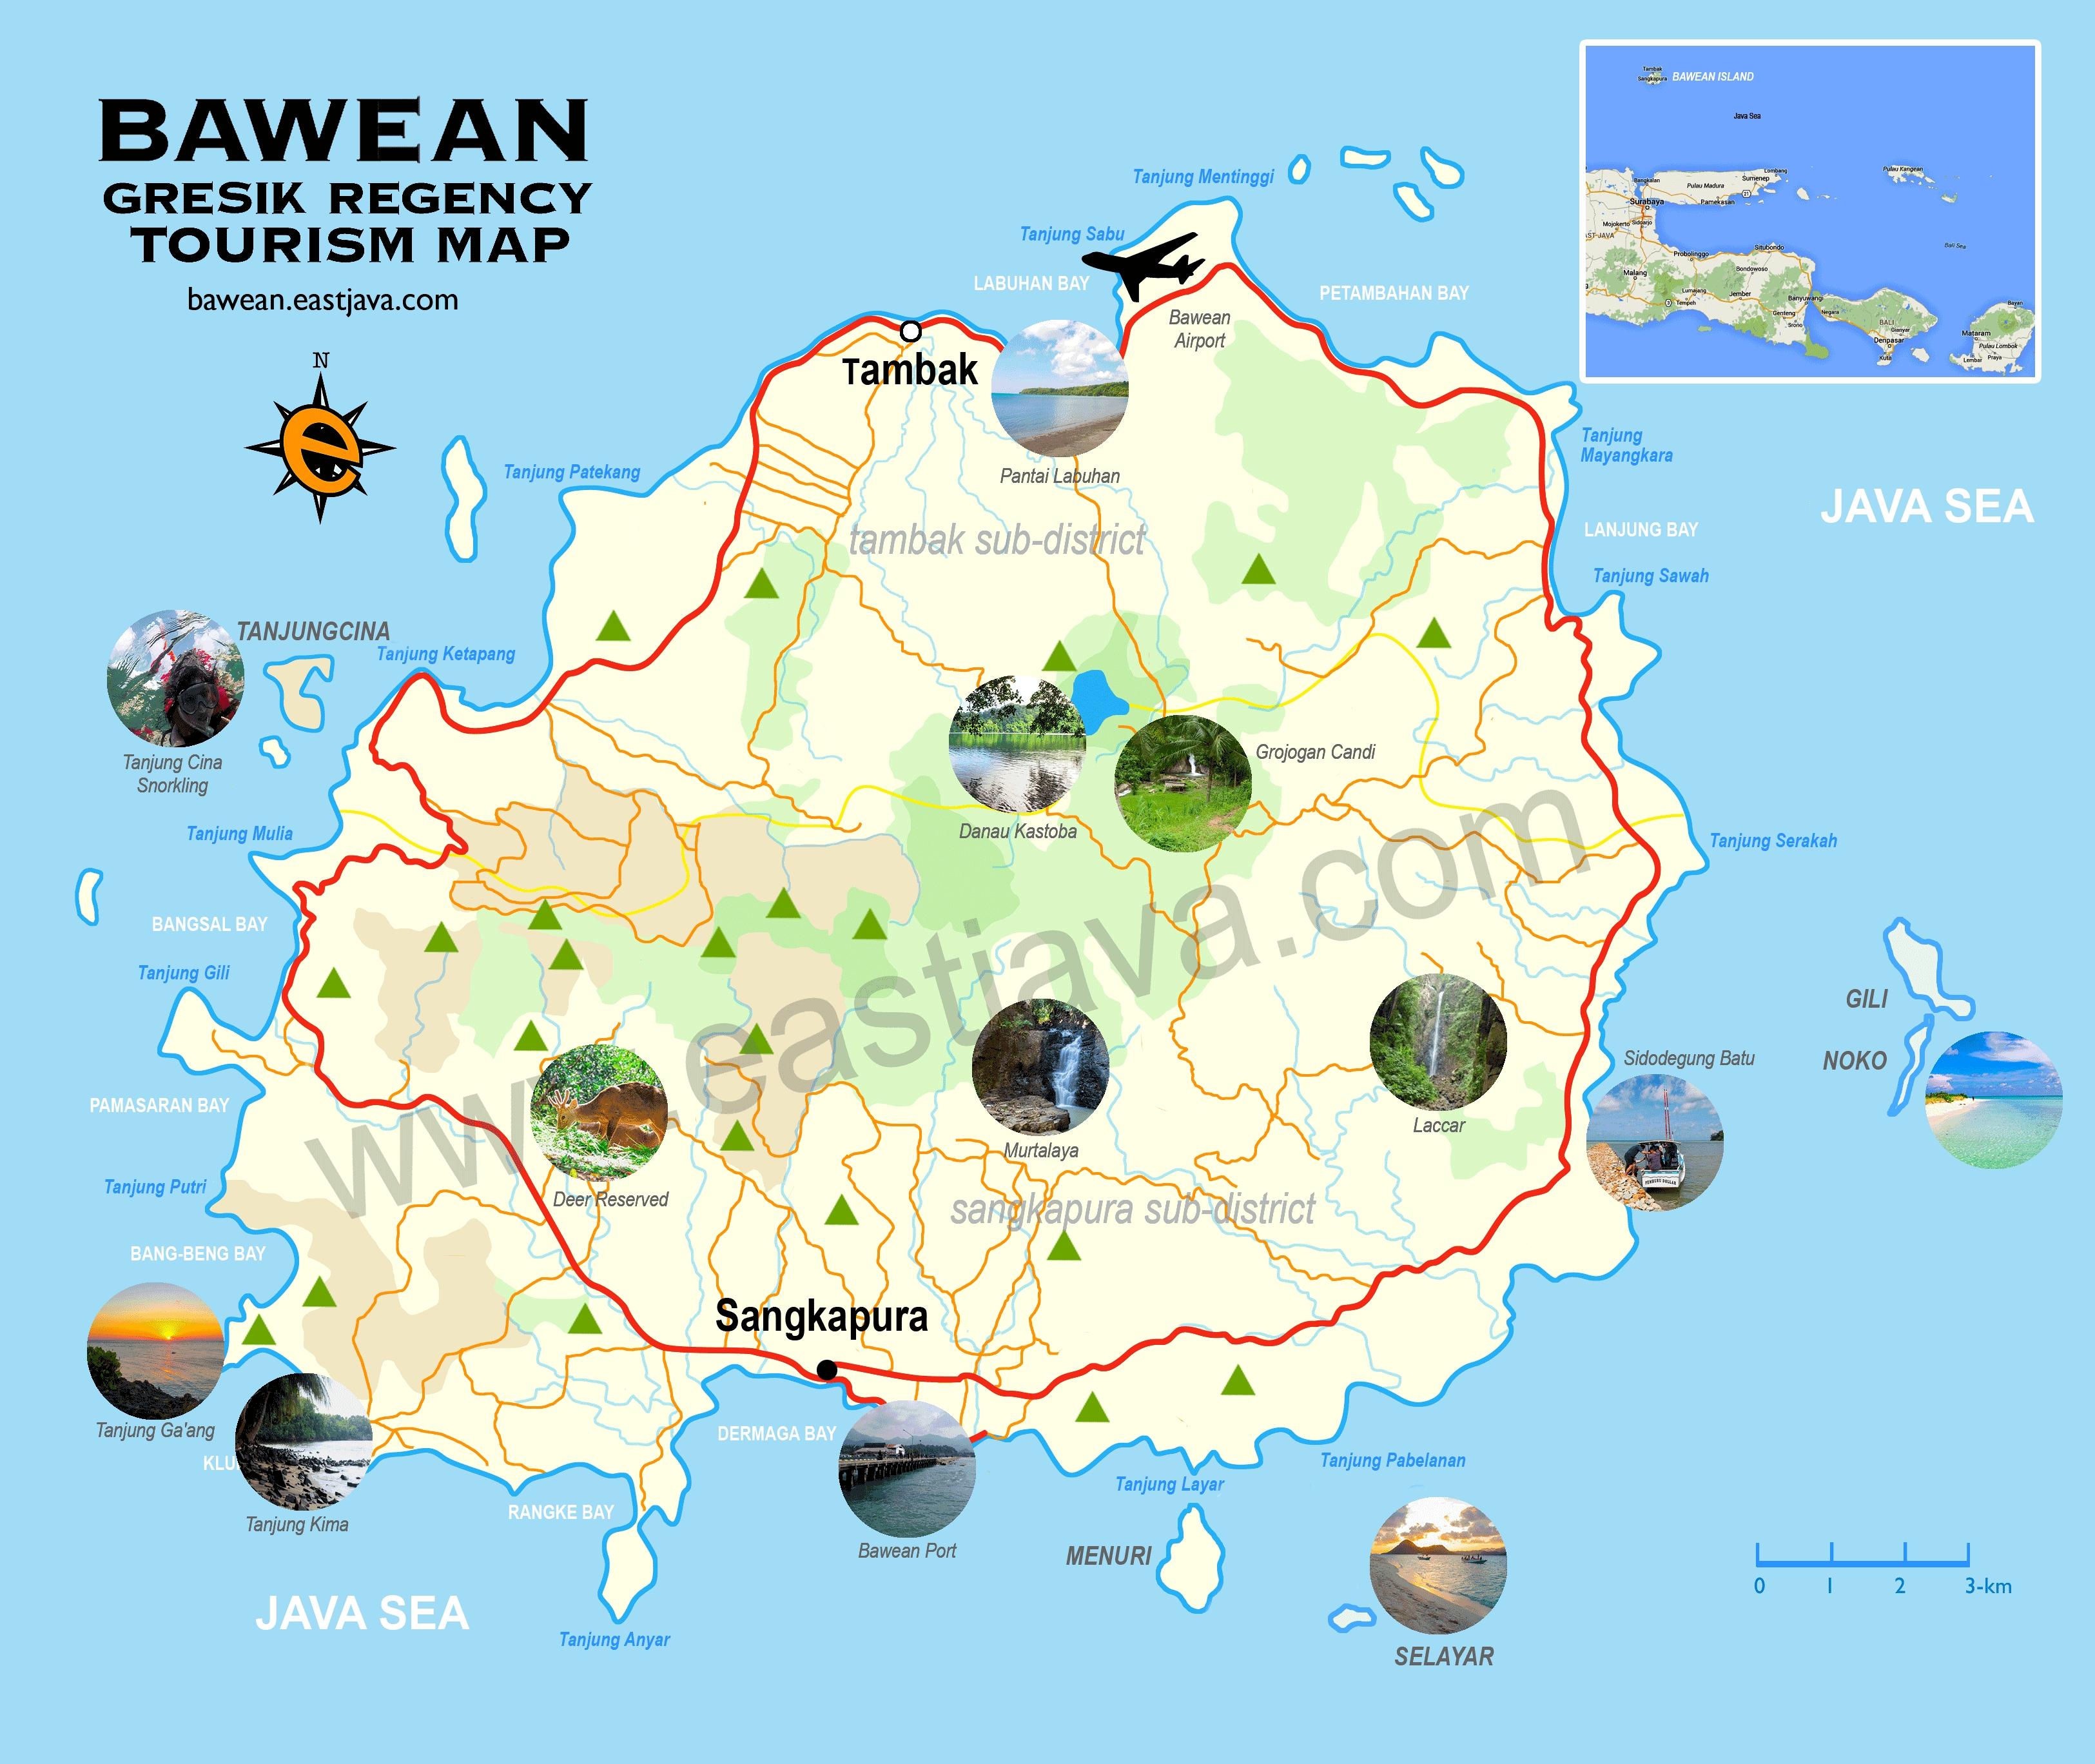 Tourist map of Bawean Island